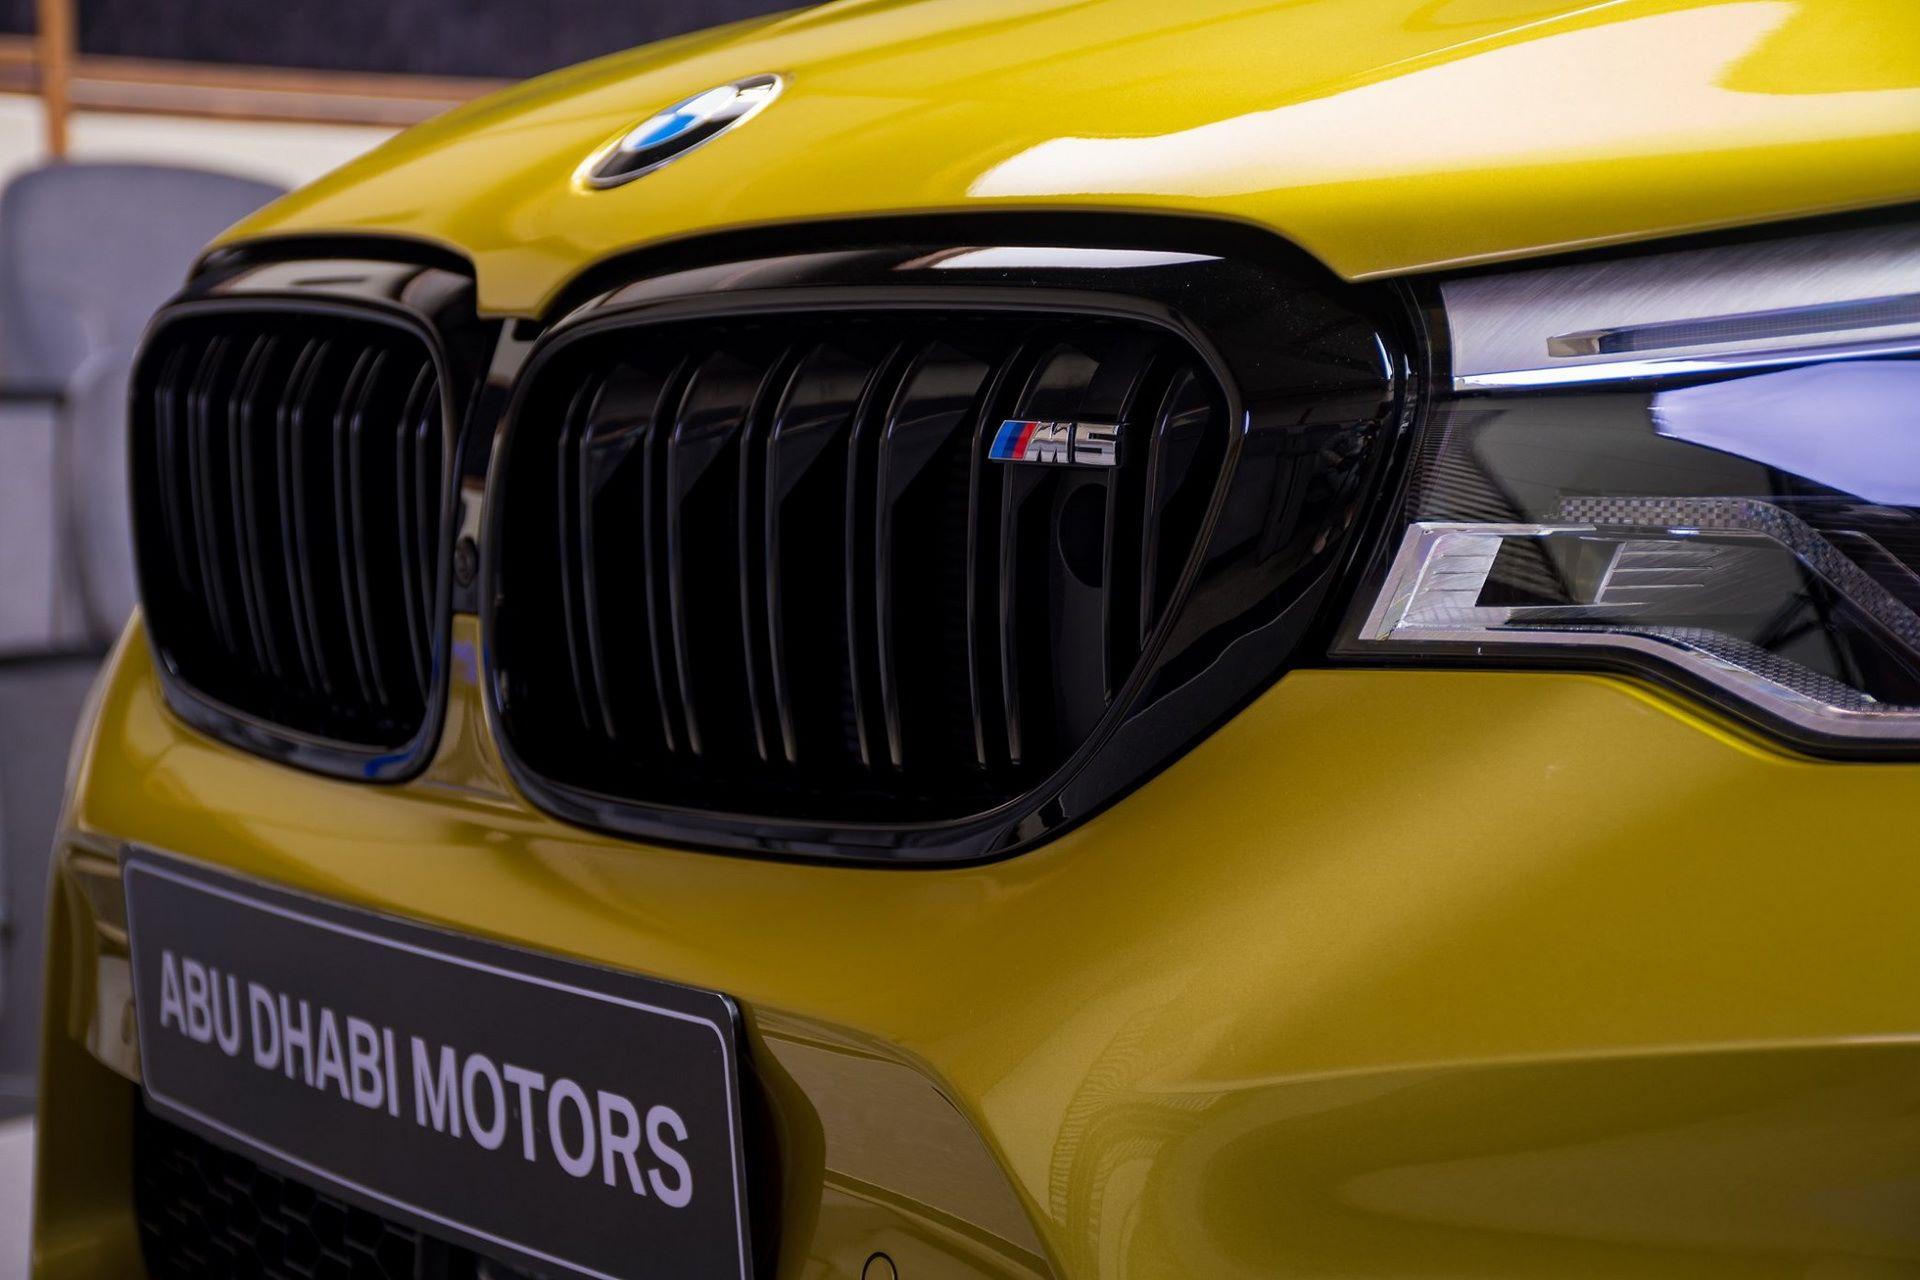 BMW-M5-Competition-Austin-Yellow-Abu-Dhabi-Motors-13